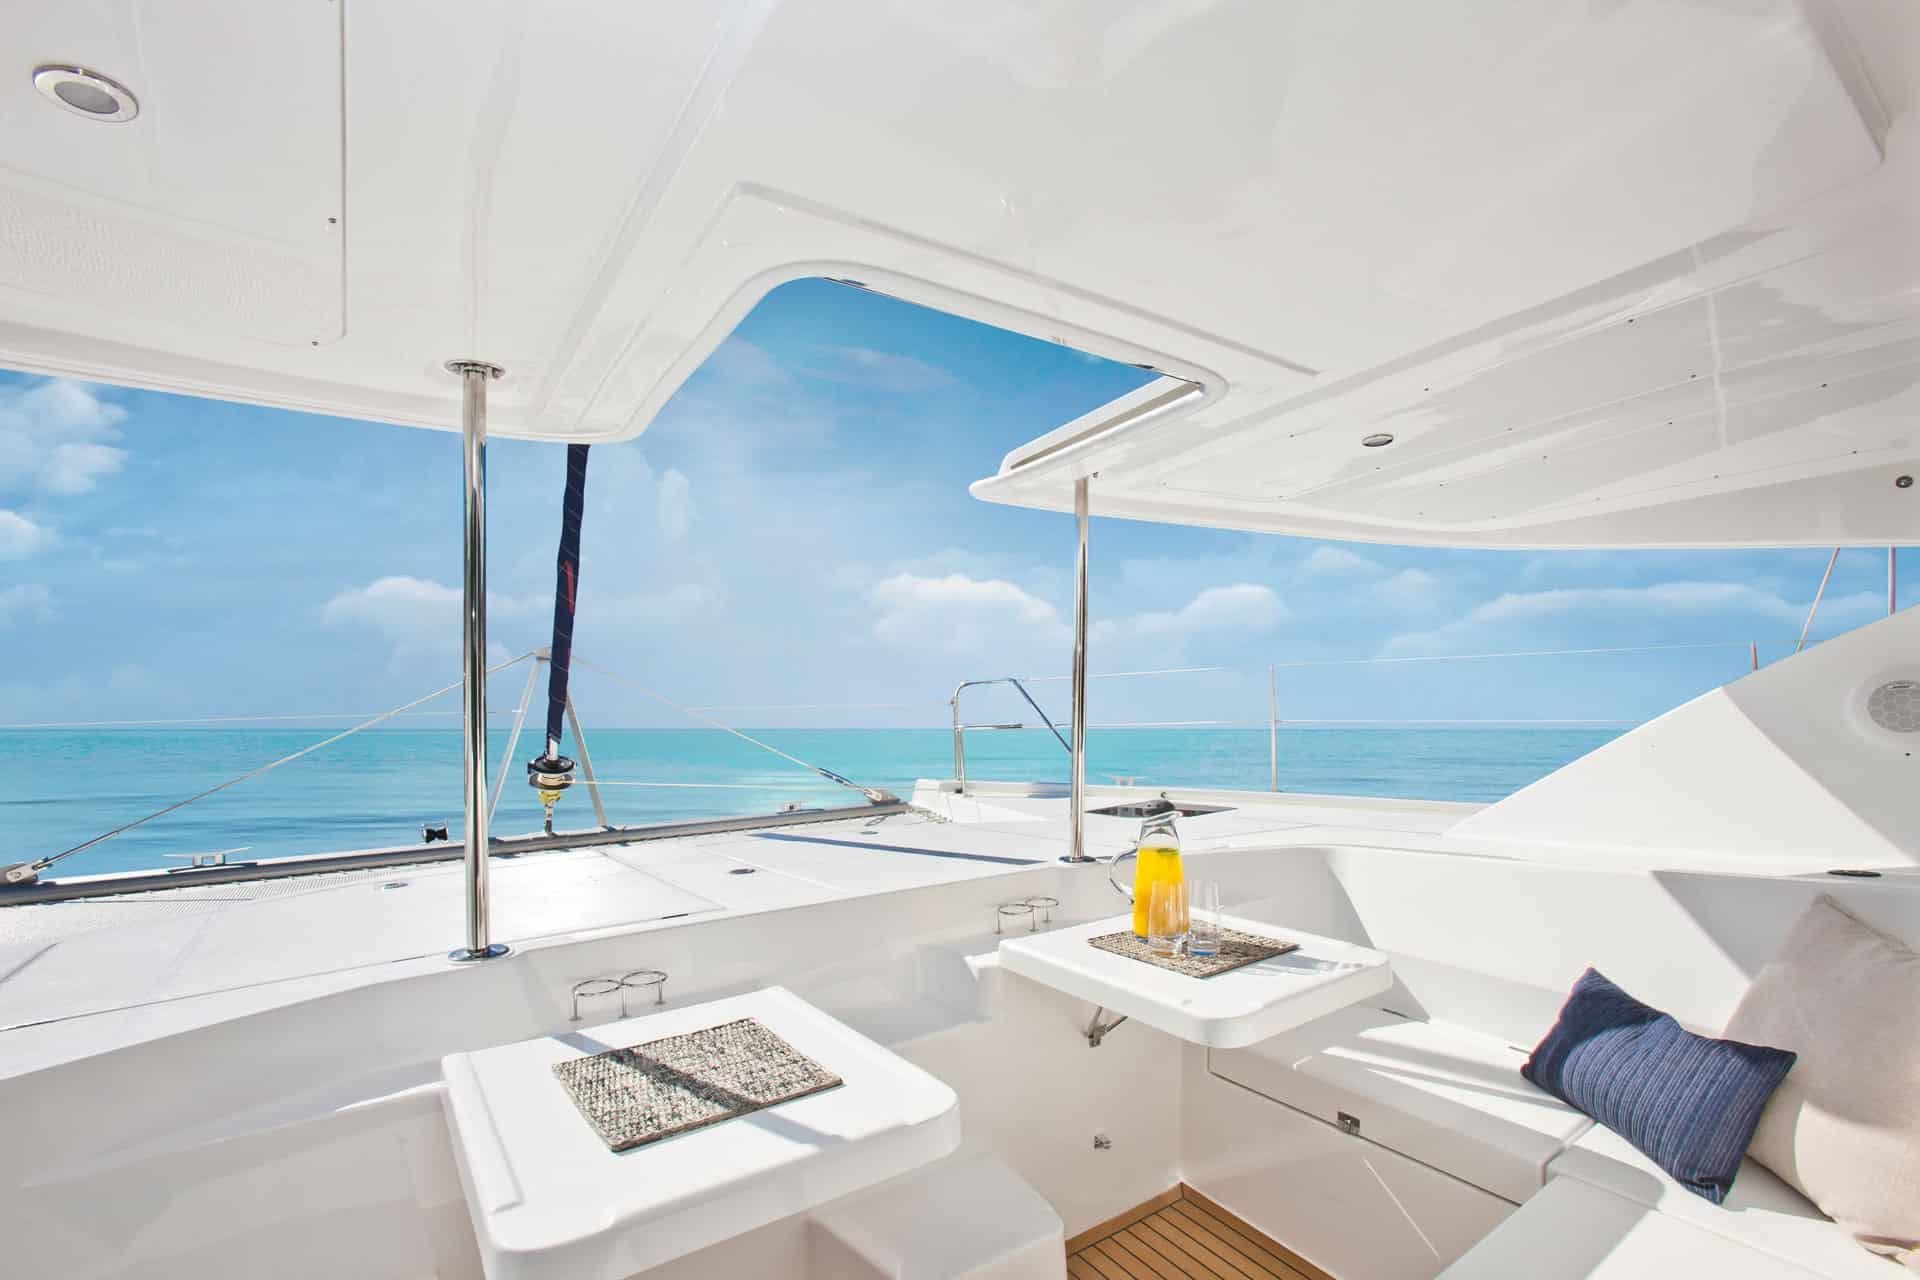 leoprad 48-yacht-charter-croatia-sailing-holidays-croatia-booking-yacht-charter-croatia-catamarans-sailboats-motorboats-gulets-luxury-yachts-boat-rental-croatia 7